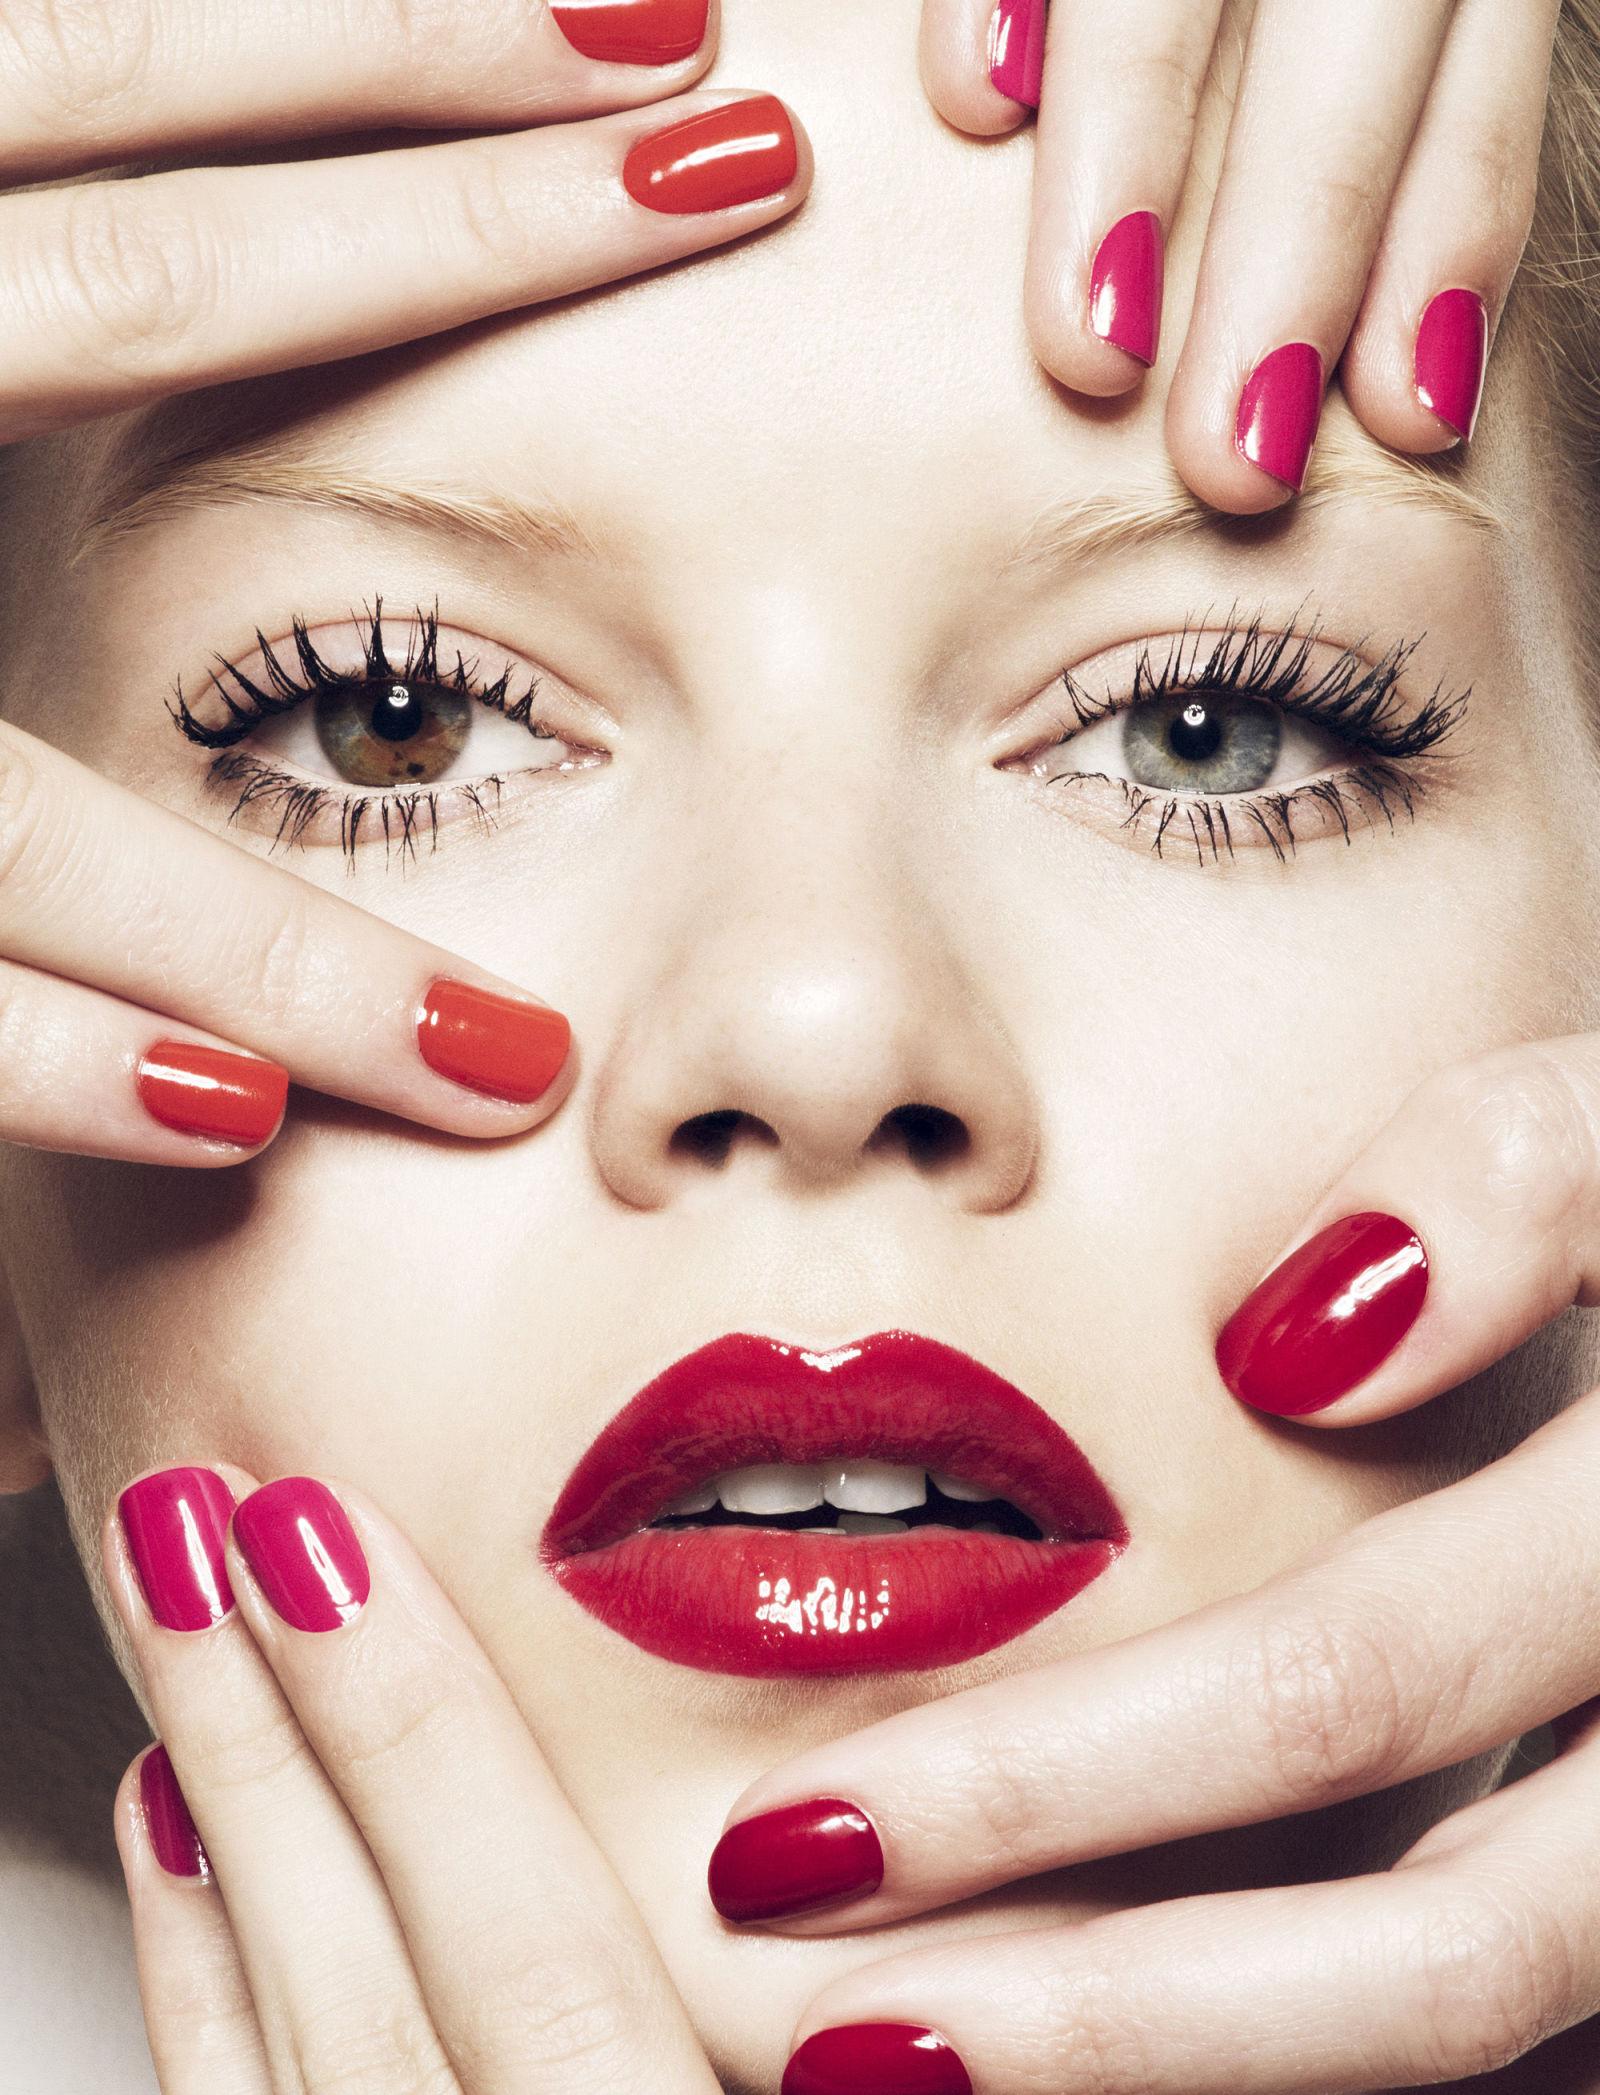 Matching Nail Polish And Lipstick Combinations - Nail Colors For Spring 2015